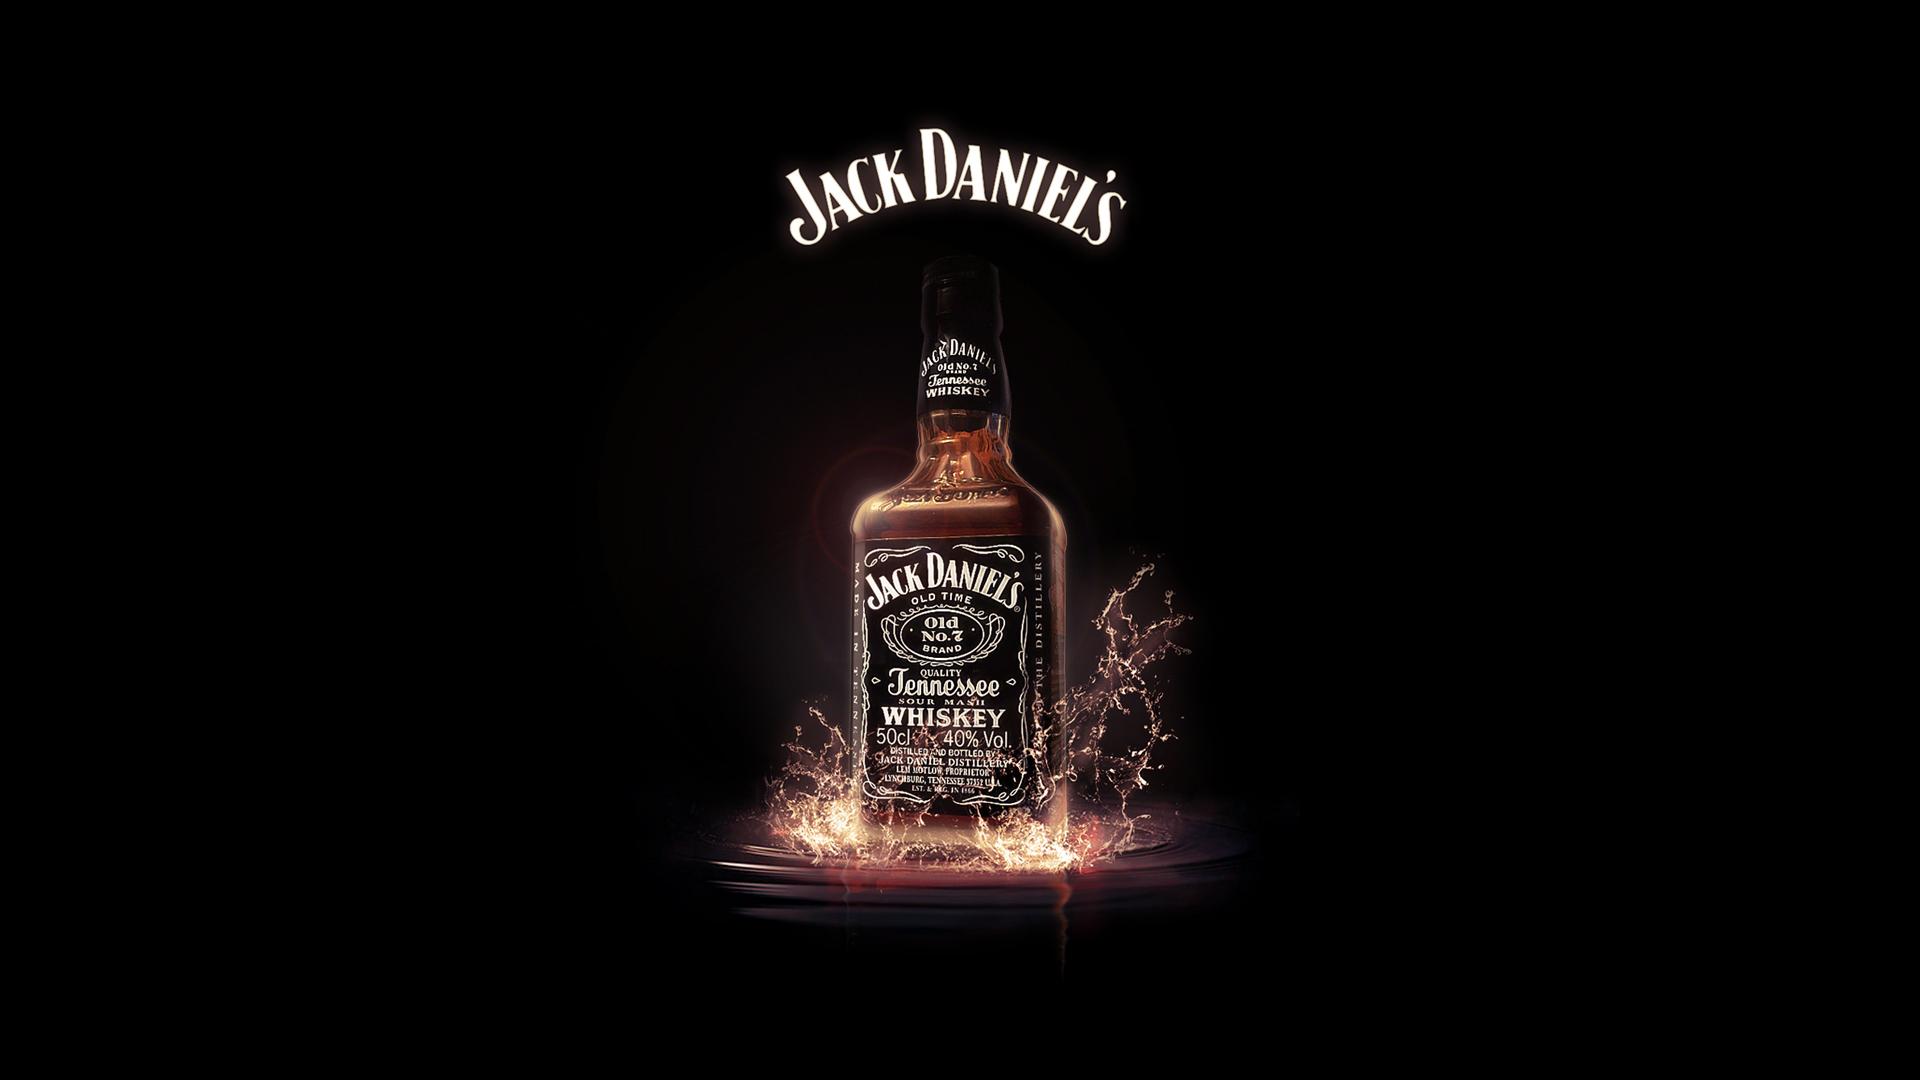 Jack Daniels Wallpaperjpg 1920x1080